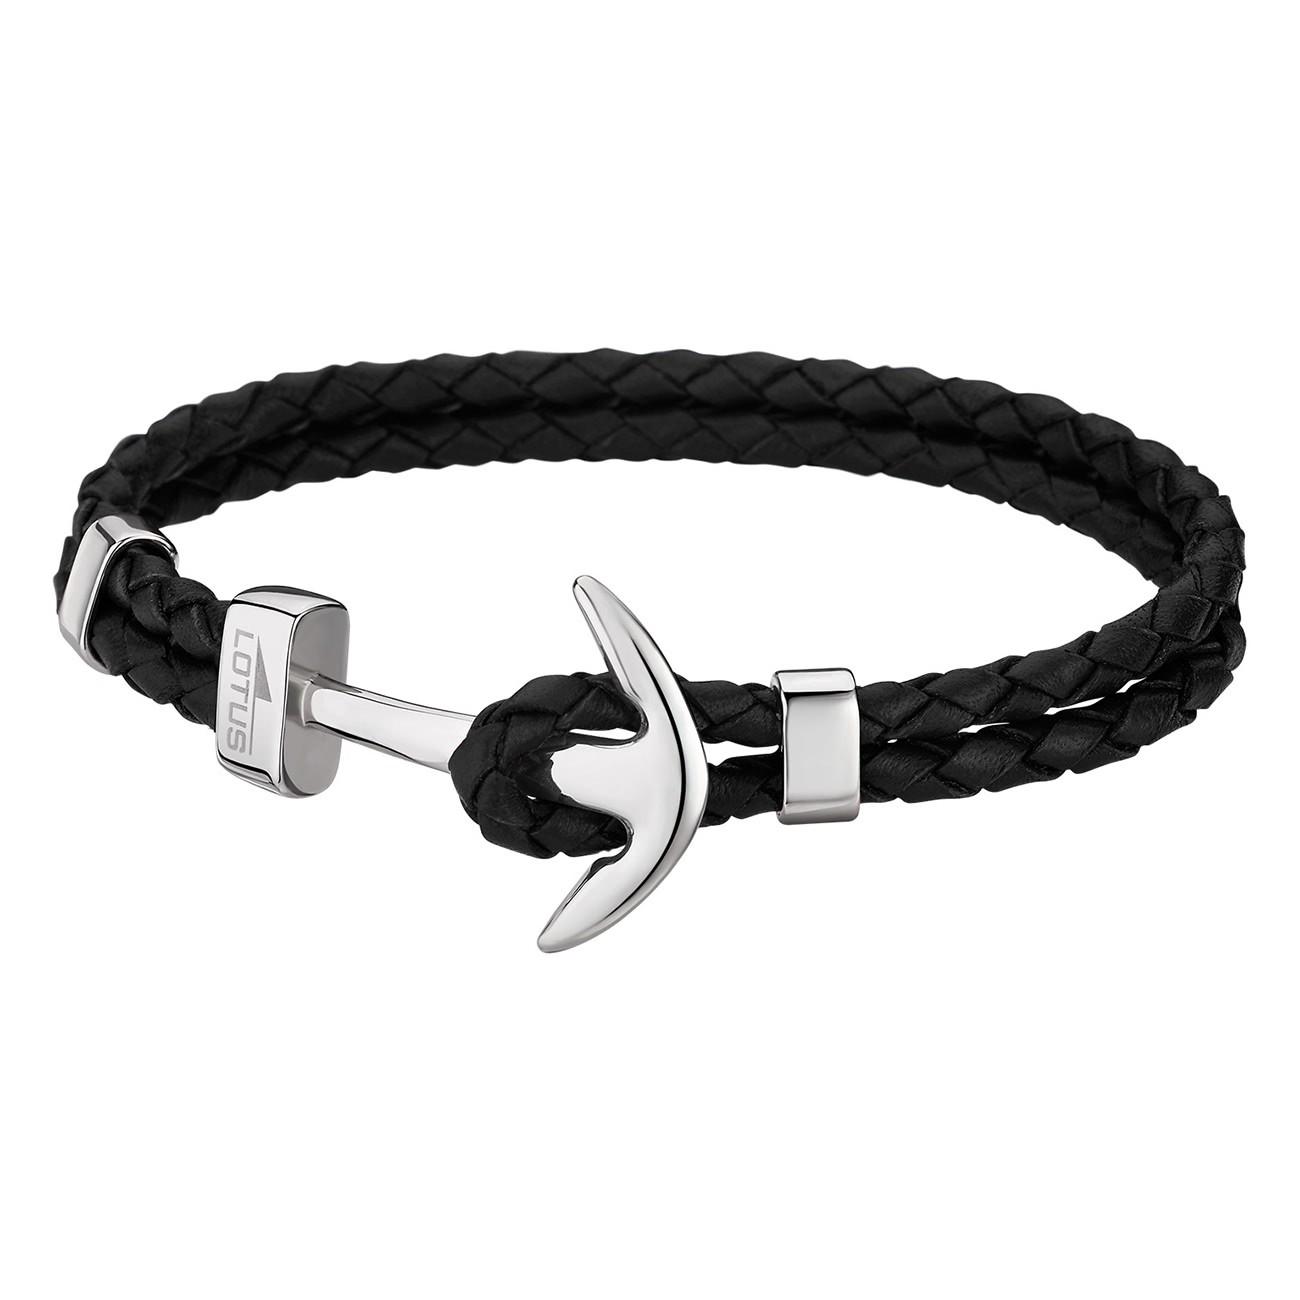 LOTUS Style Armband Herren Leder schwarz LS1832-2/1 Anker Schmuck JLS1832-2-1